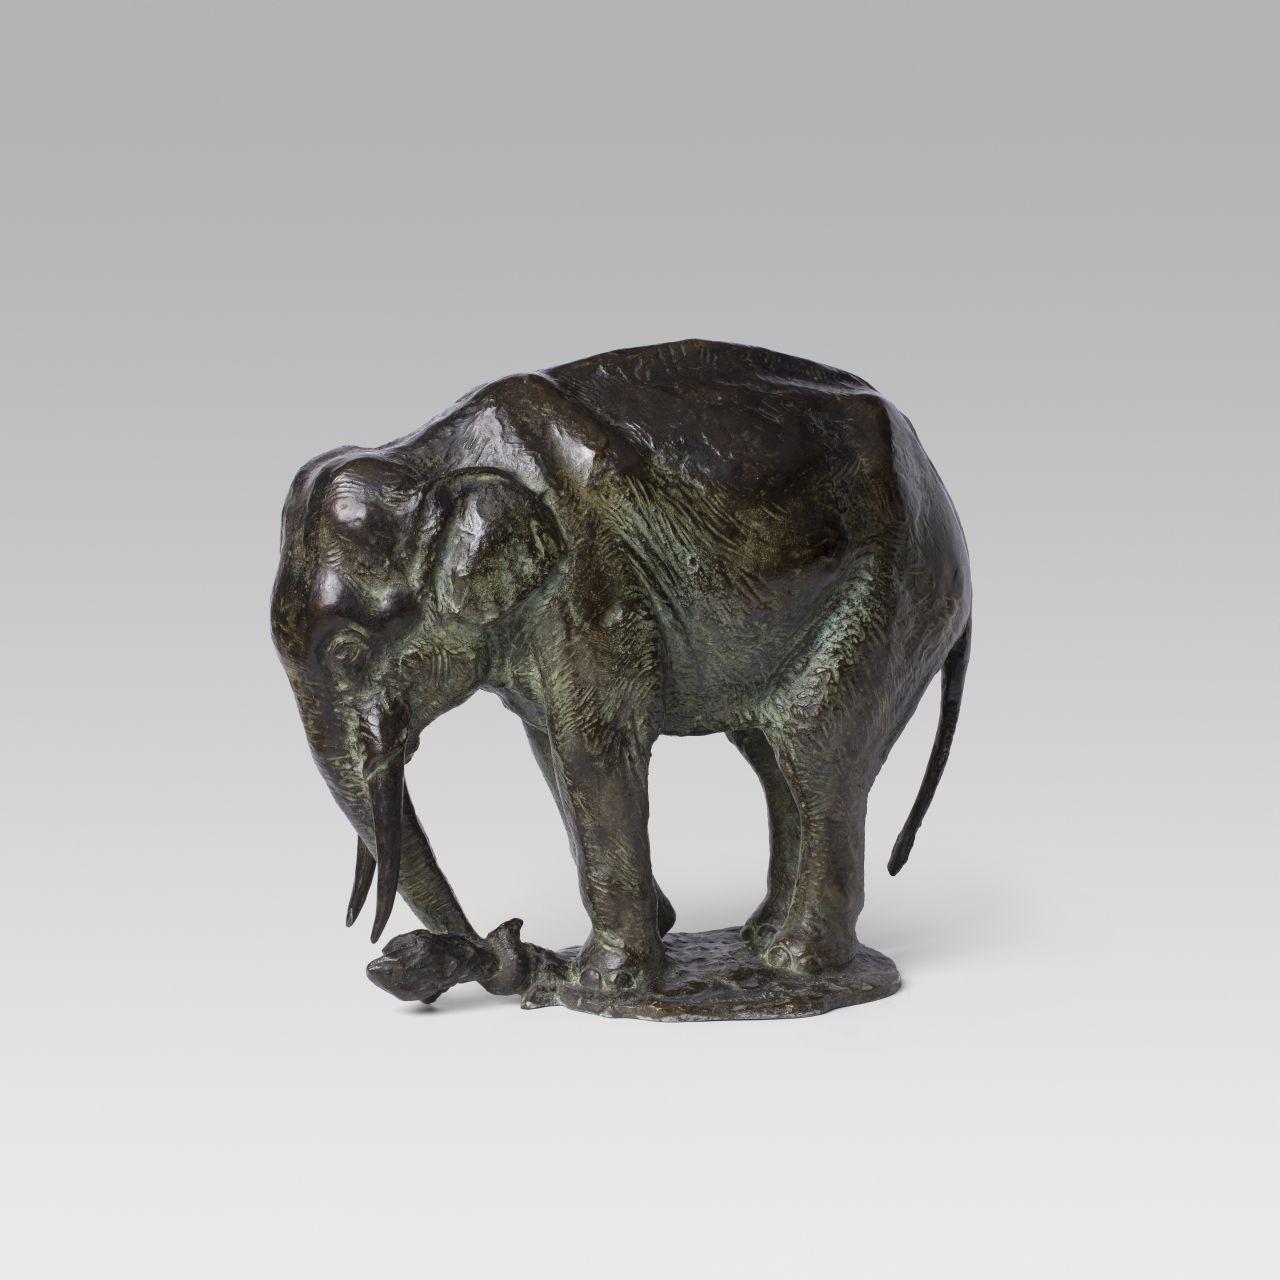 Elefante arrancando un tronco, Gustave Adolphe Hierholtz